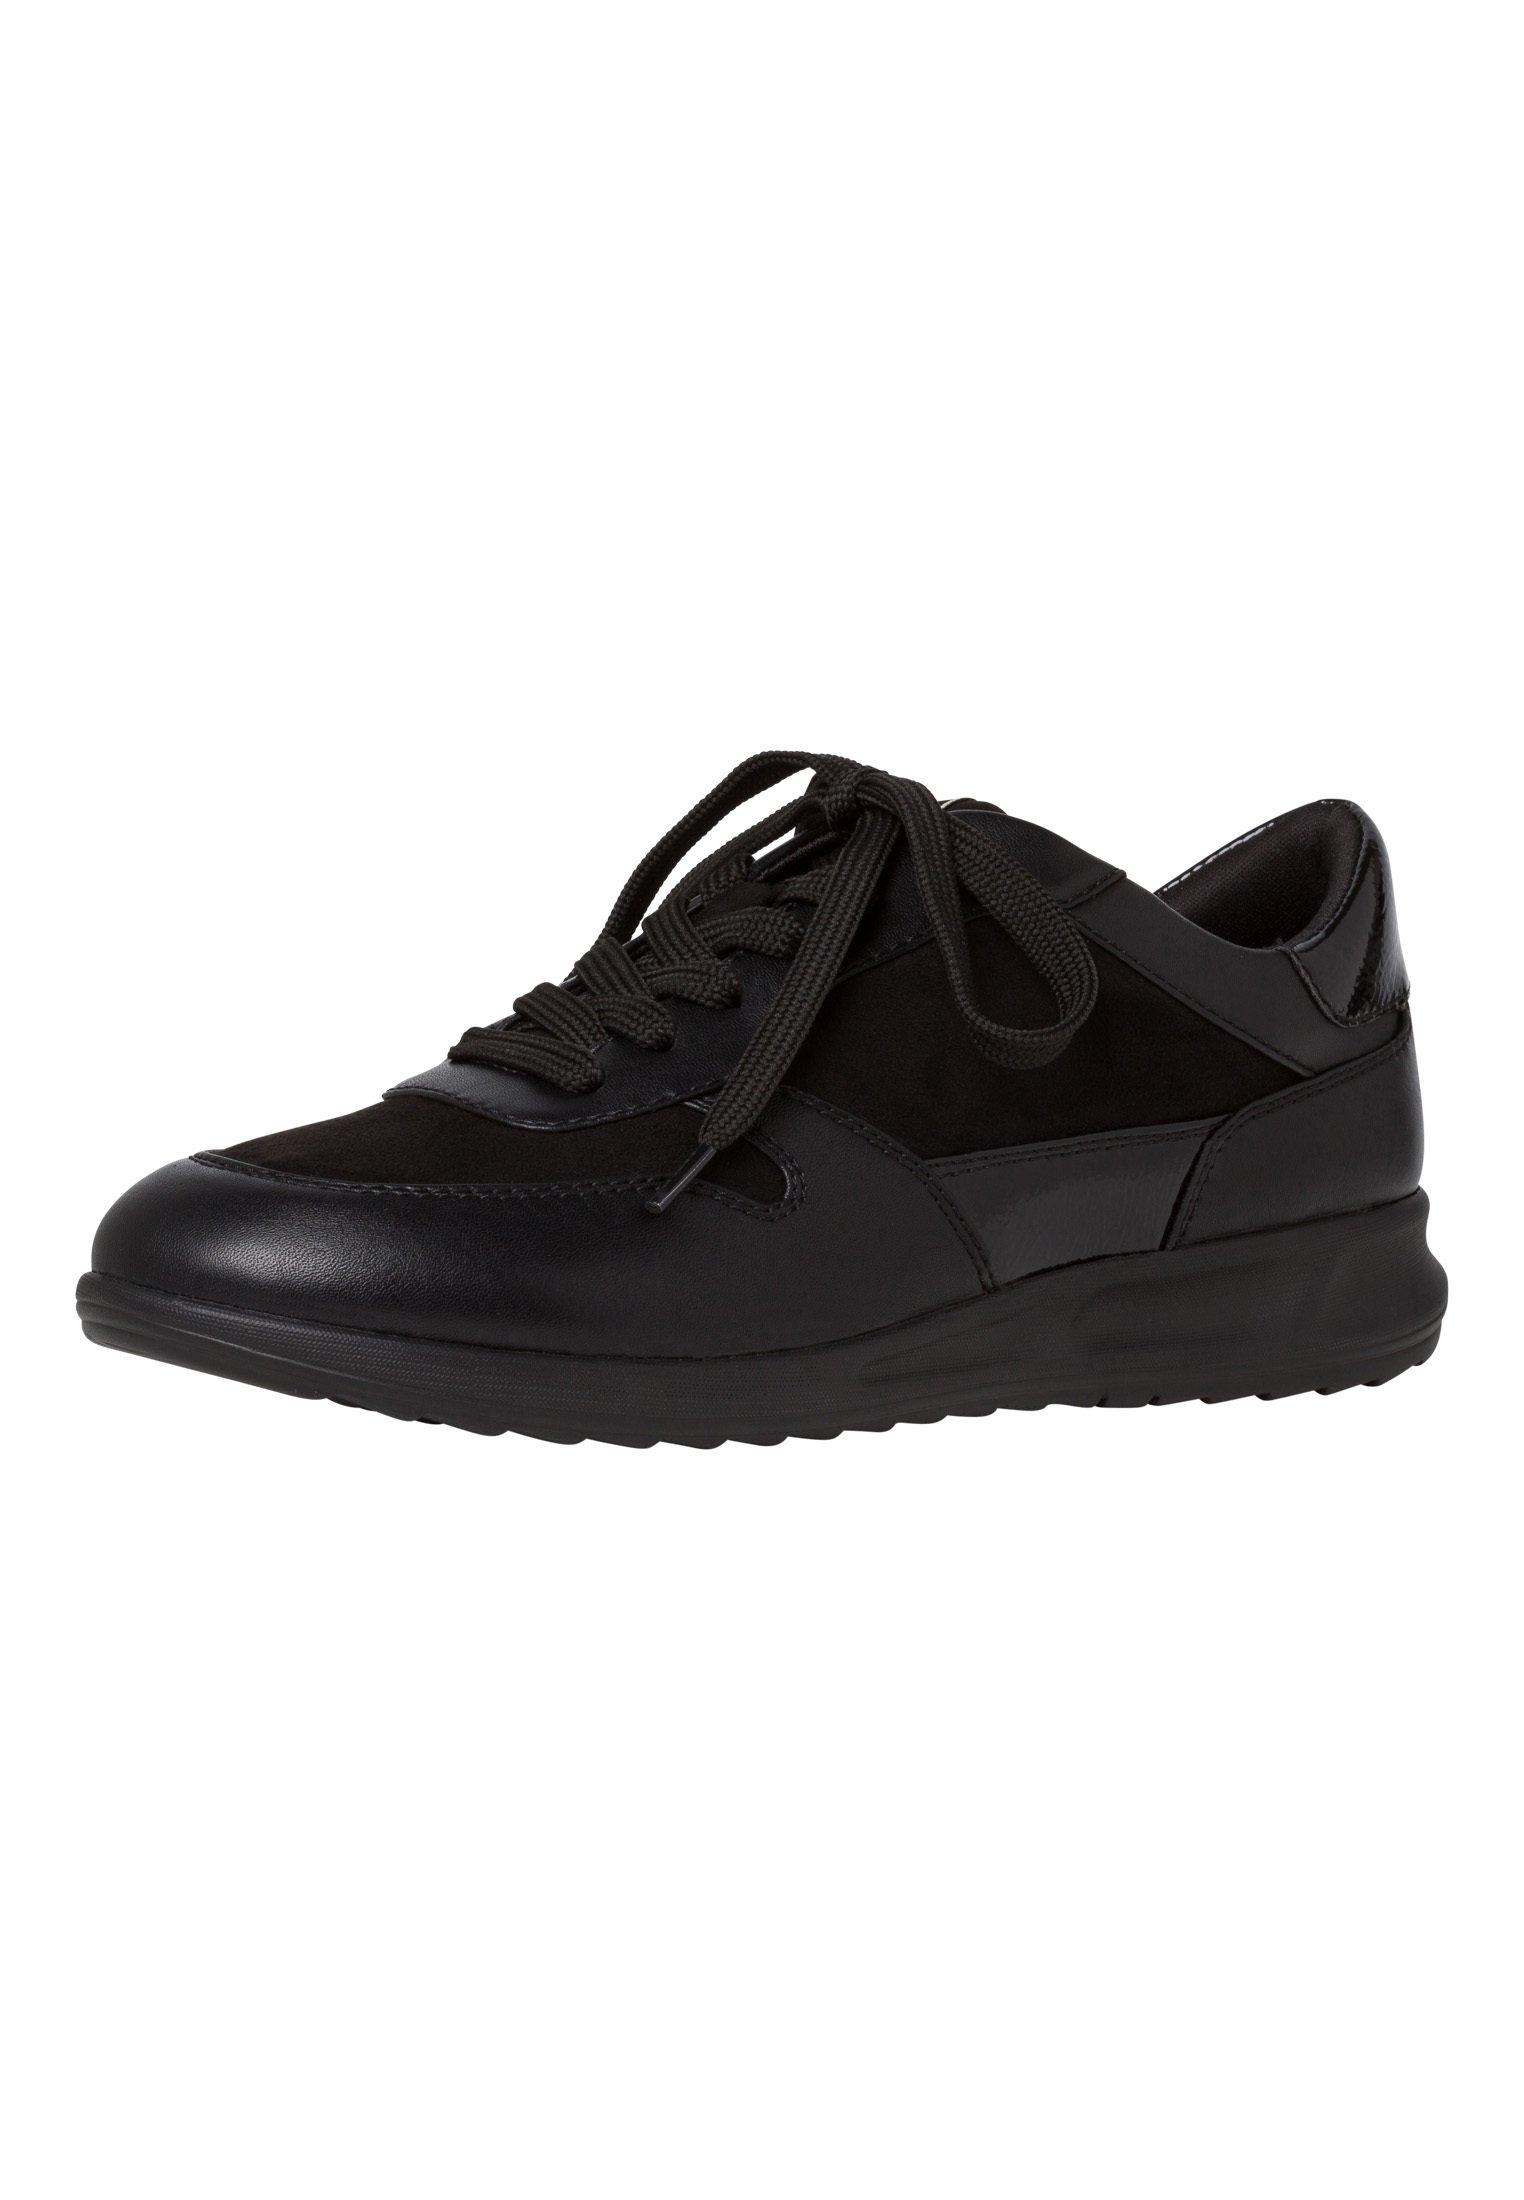 Tamaris Sneaker low black uni/schwarz